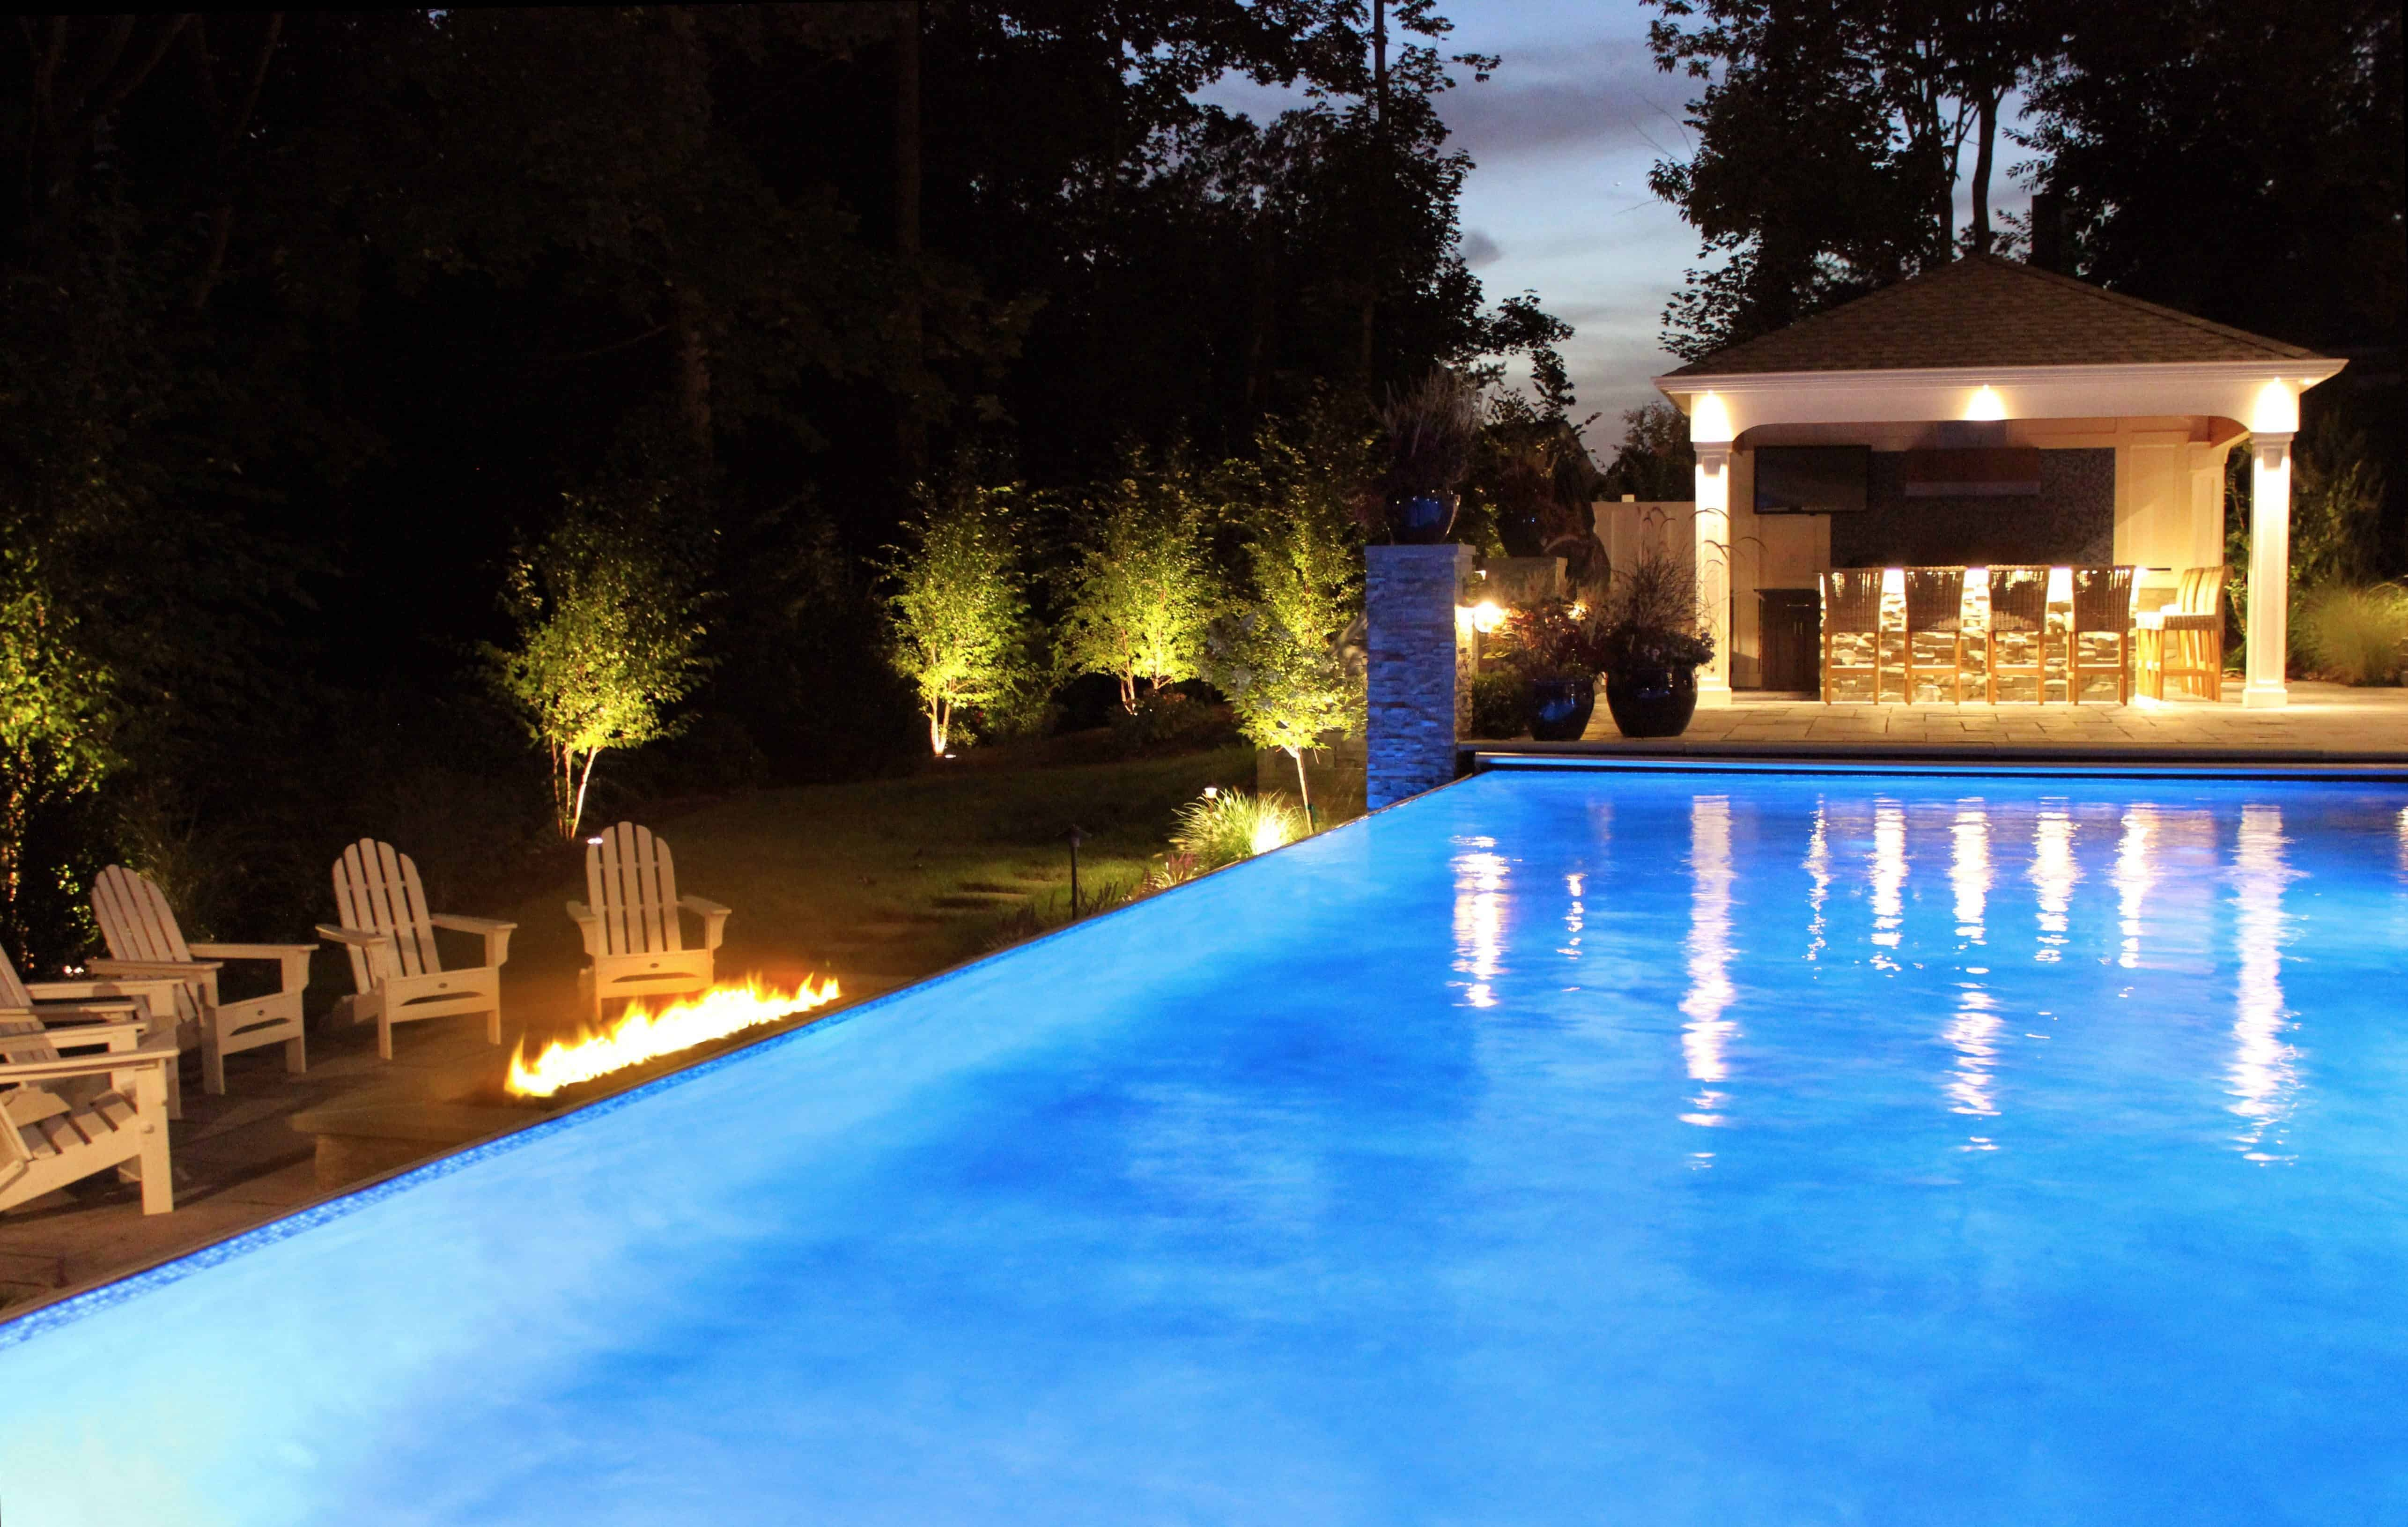 16' x 32' Pool with Fiberglass Steps - Dix Hills, Long Island NY